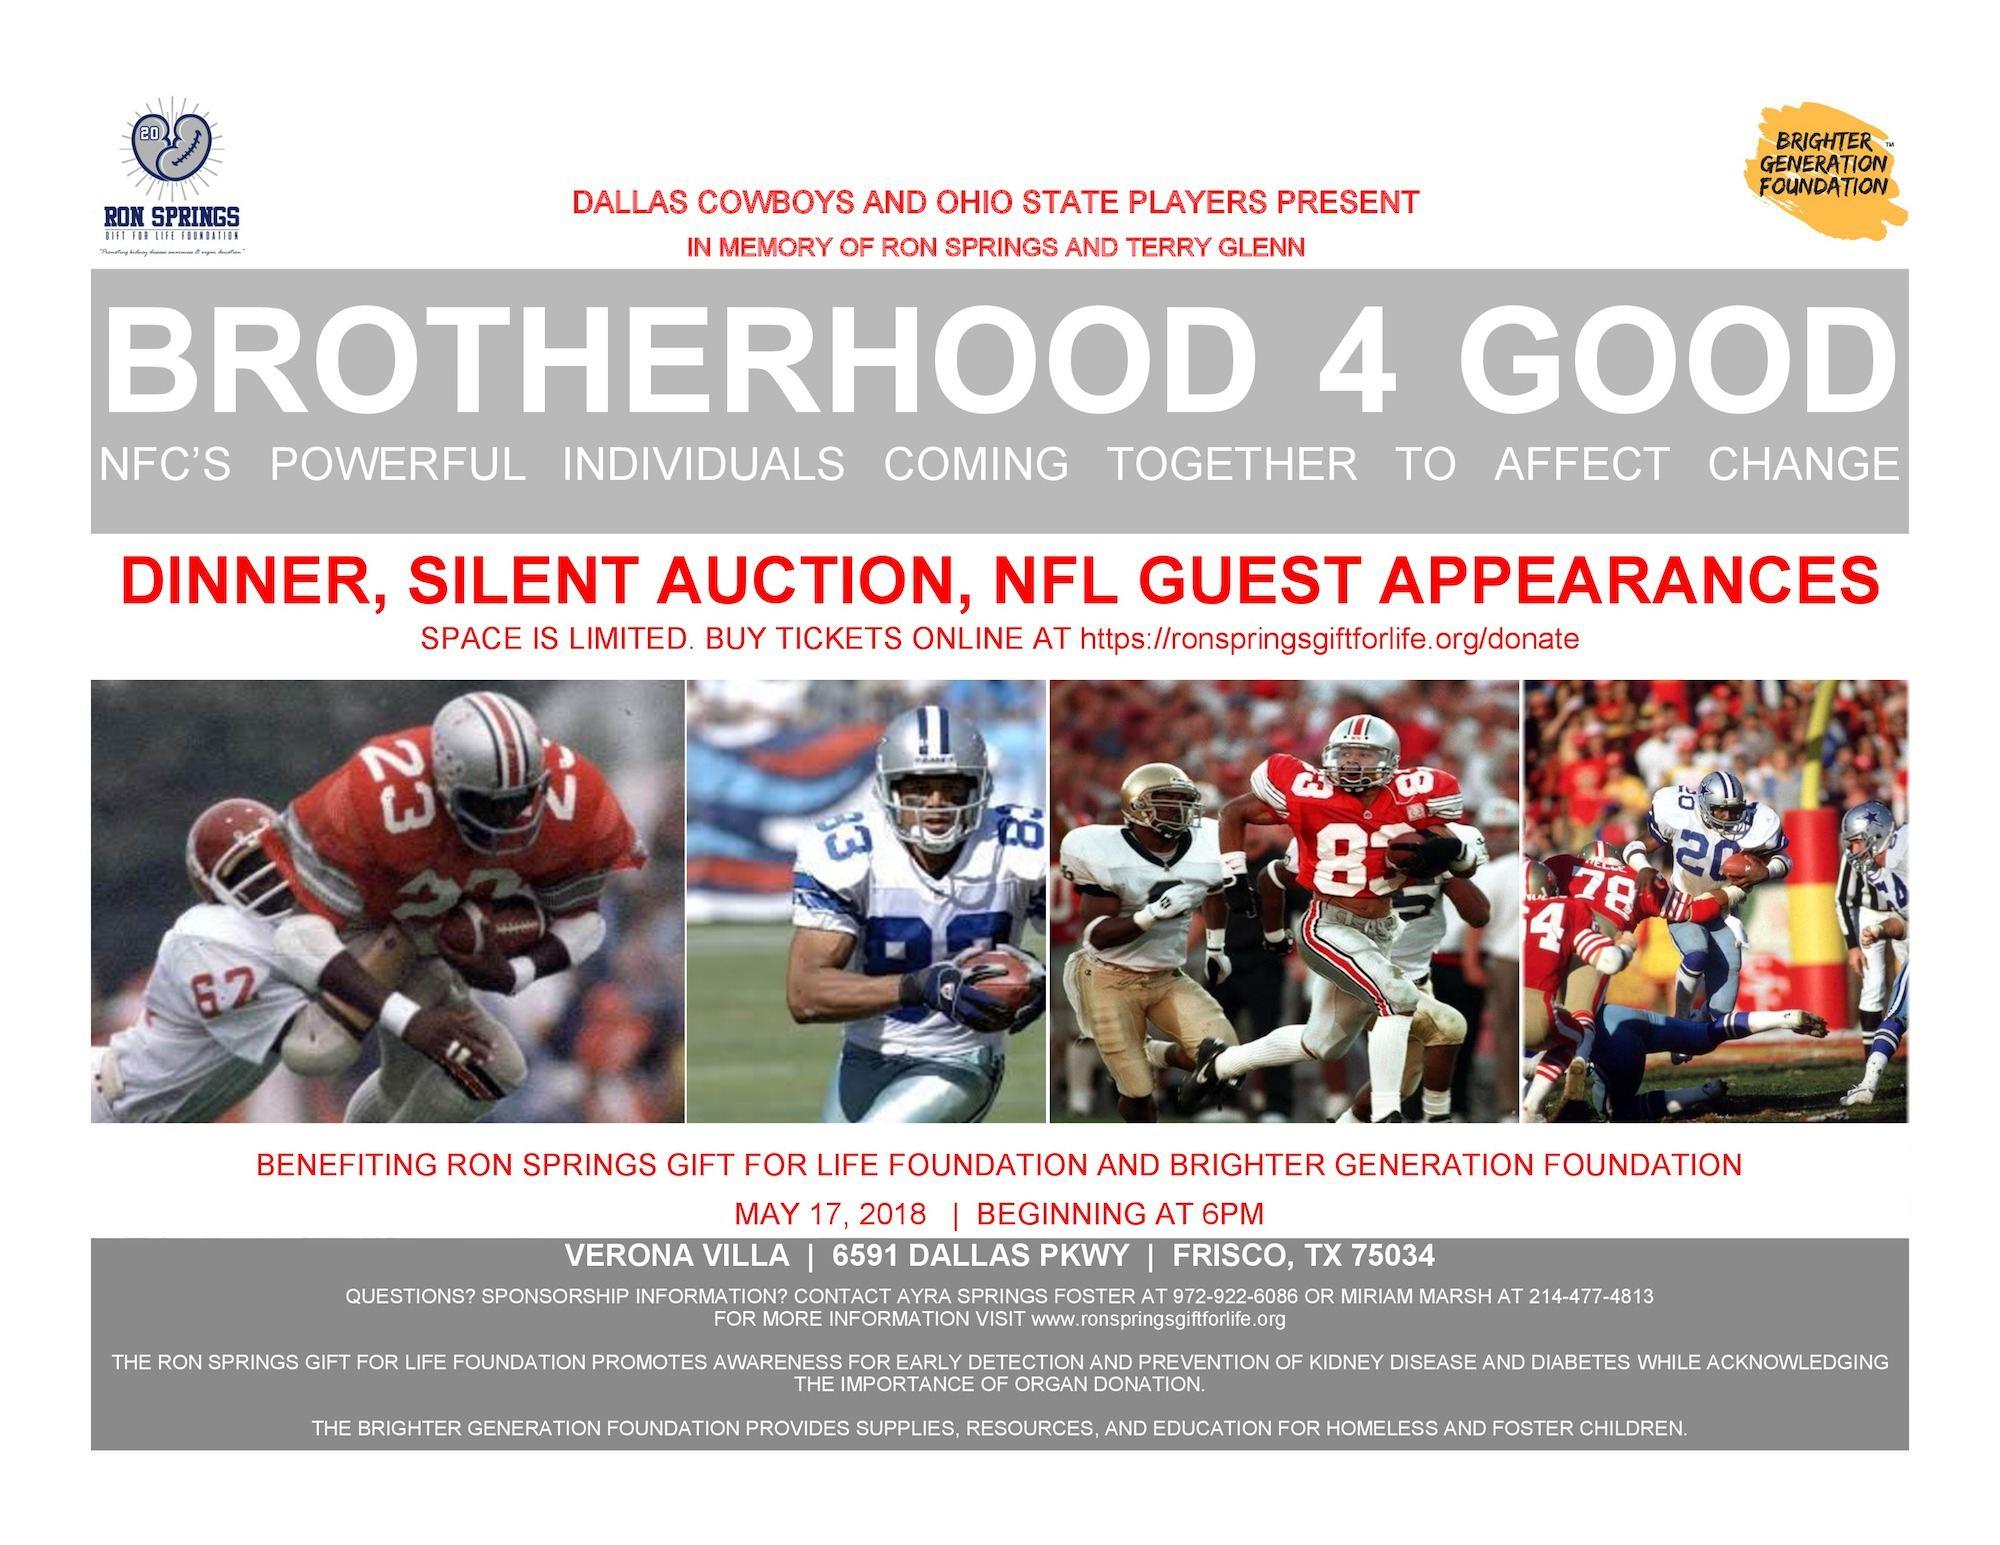 Brotherhood 4 Good Charity Dinner